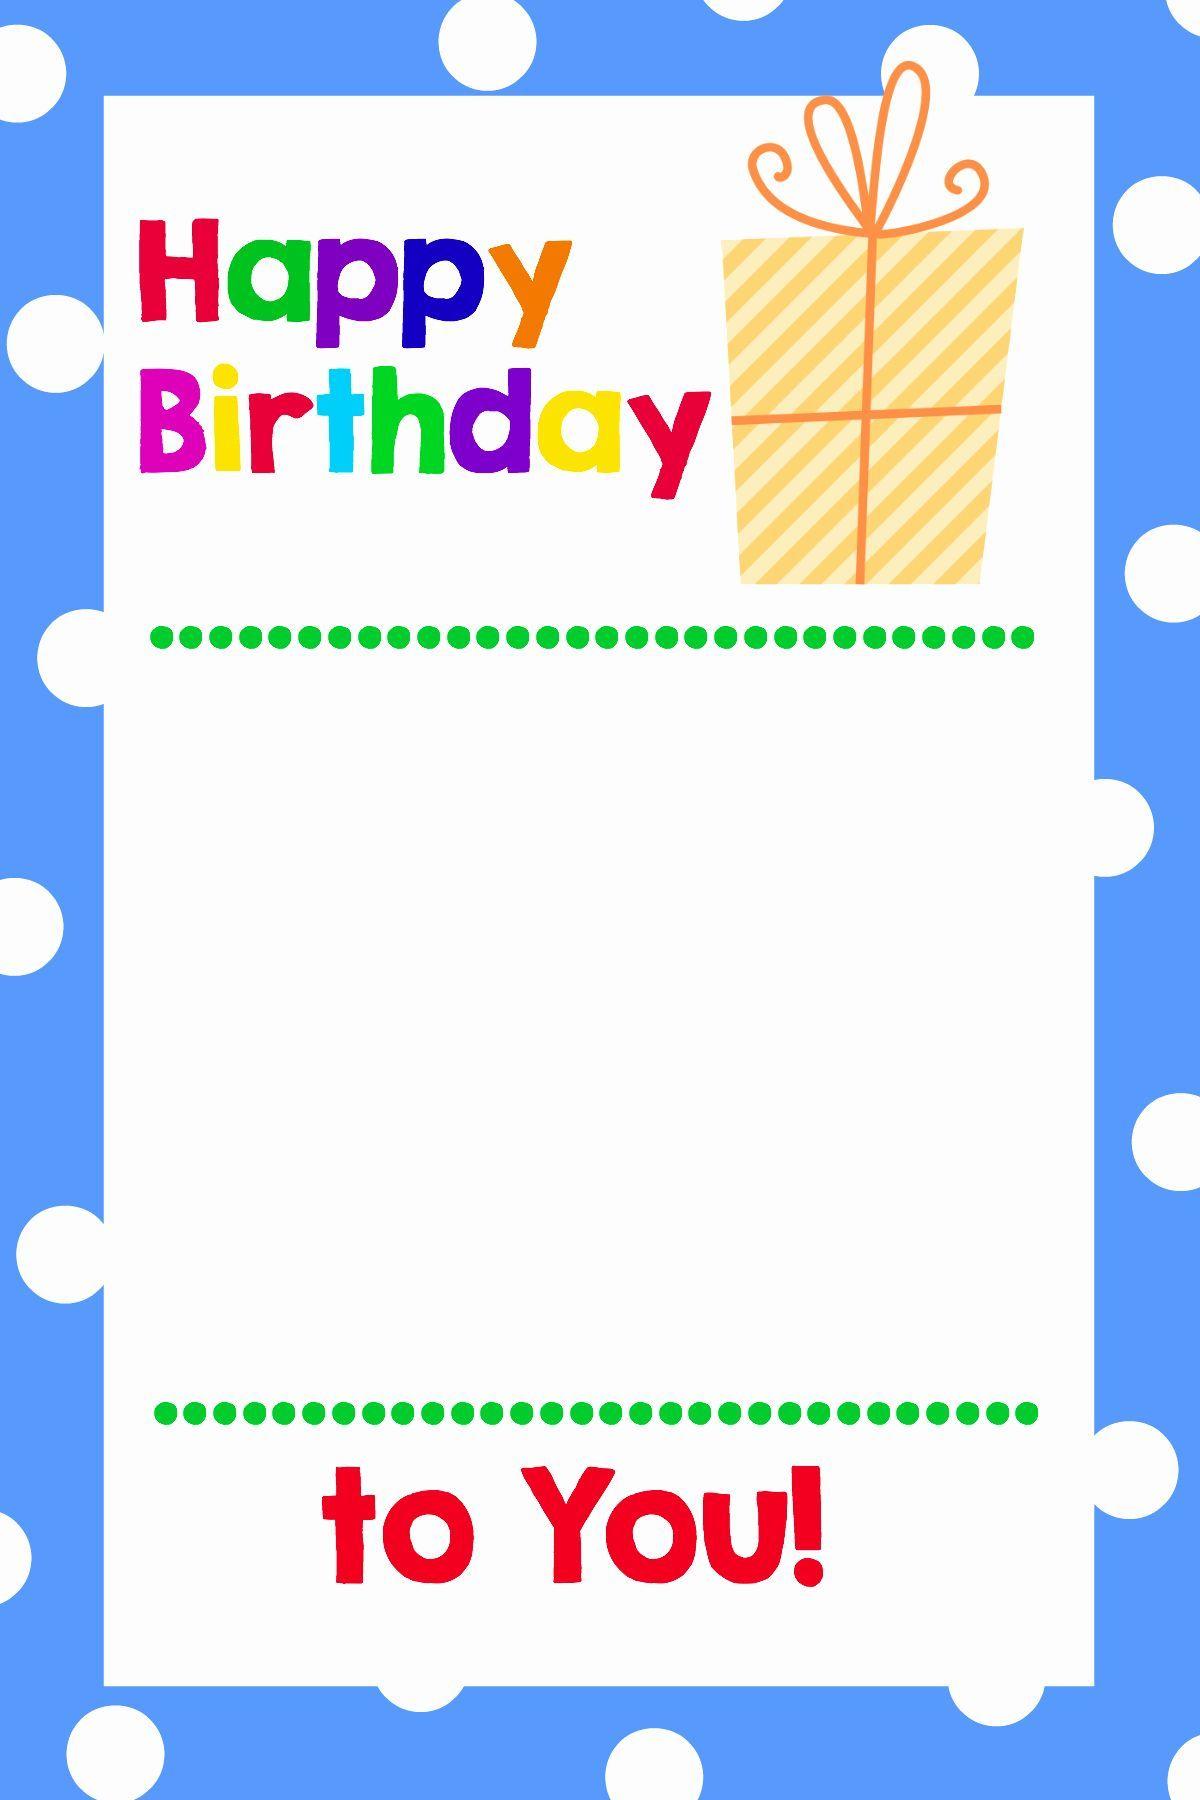 Happy Birthday Card Template Luxury Free Printable Birthday Cards